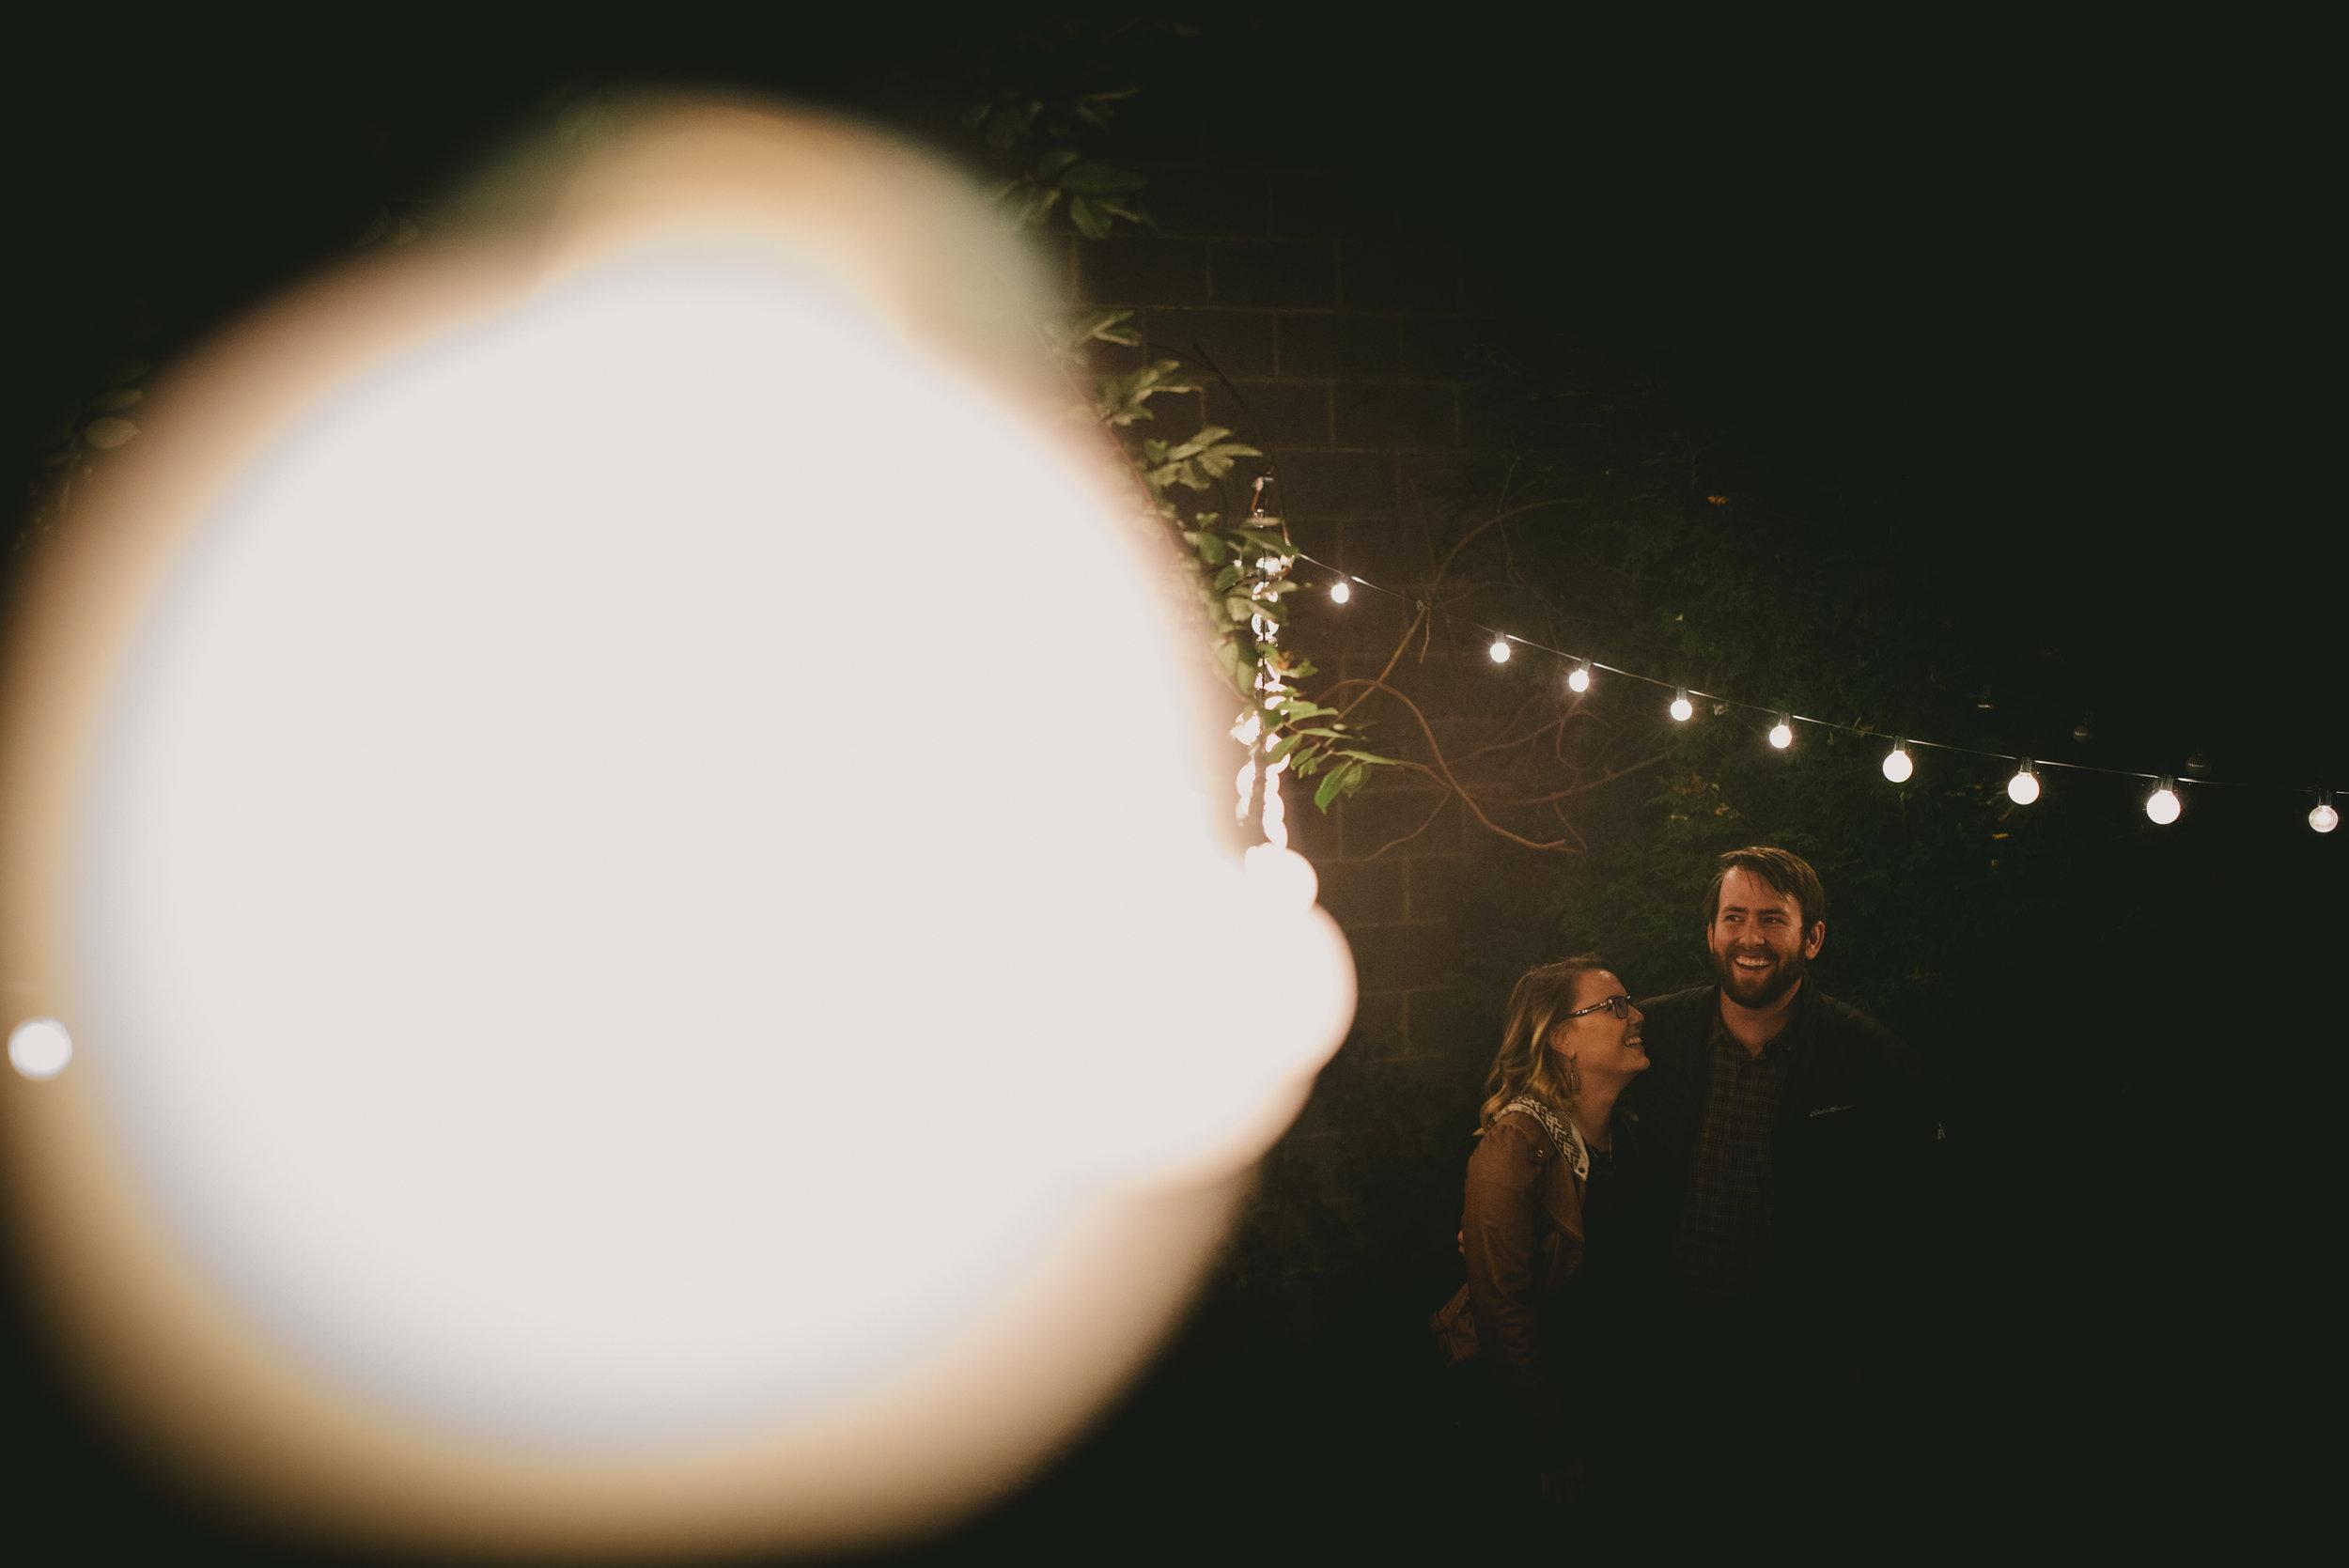 enchanted garden tea lights above the couple in Greensboro, North Carolina